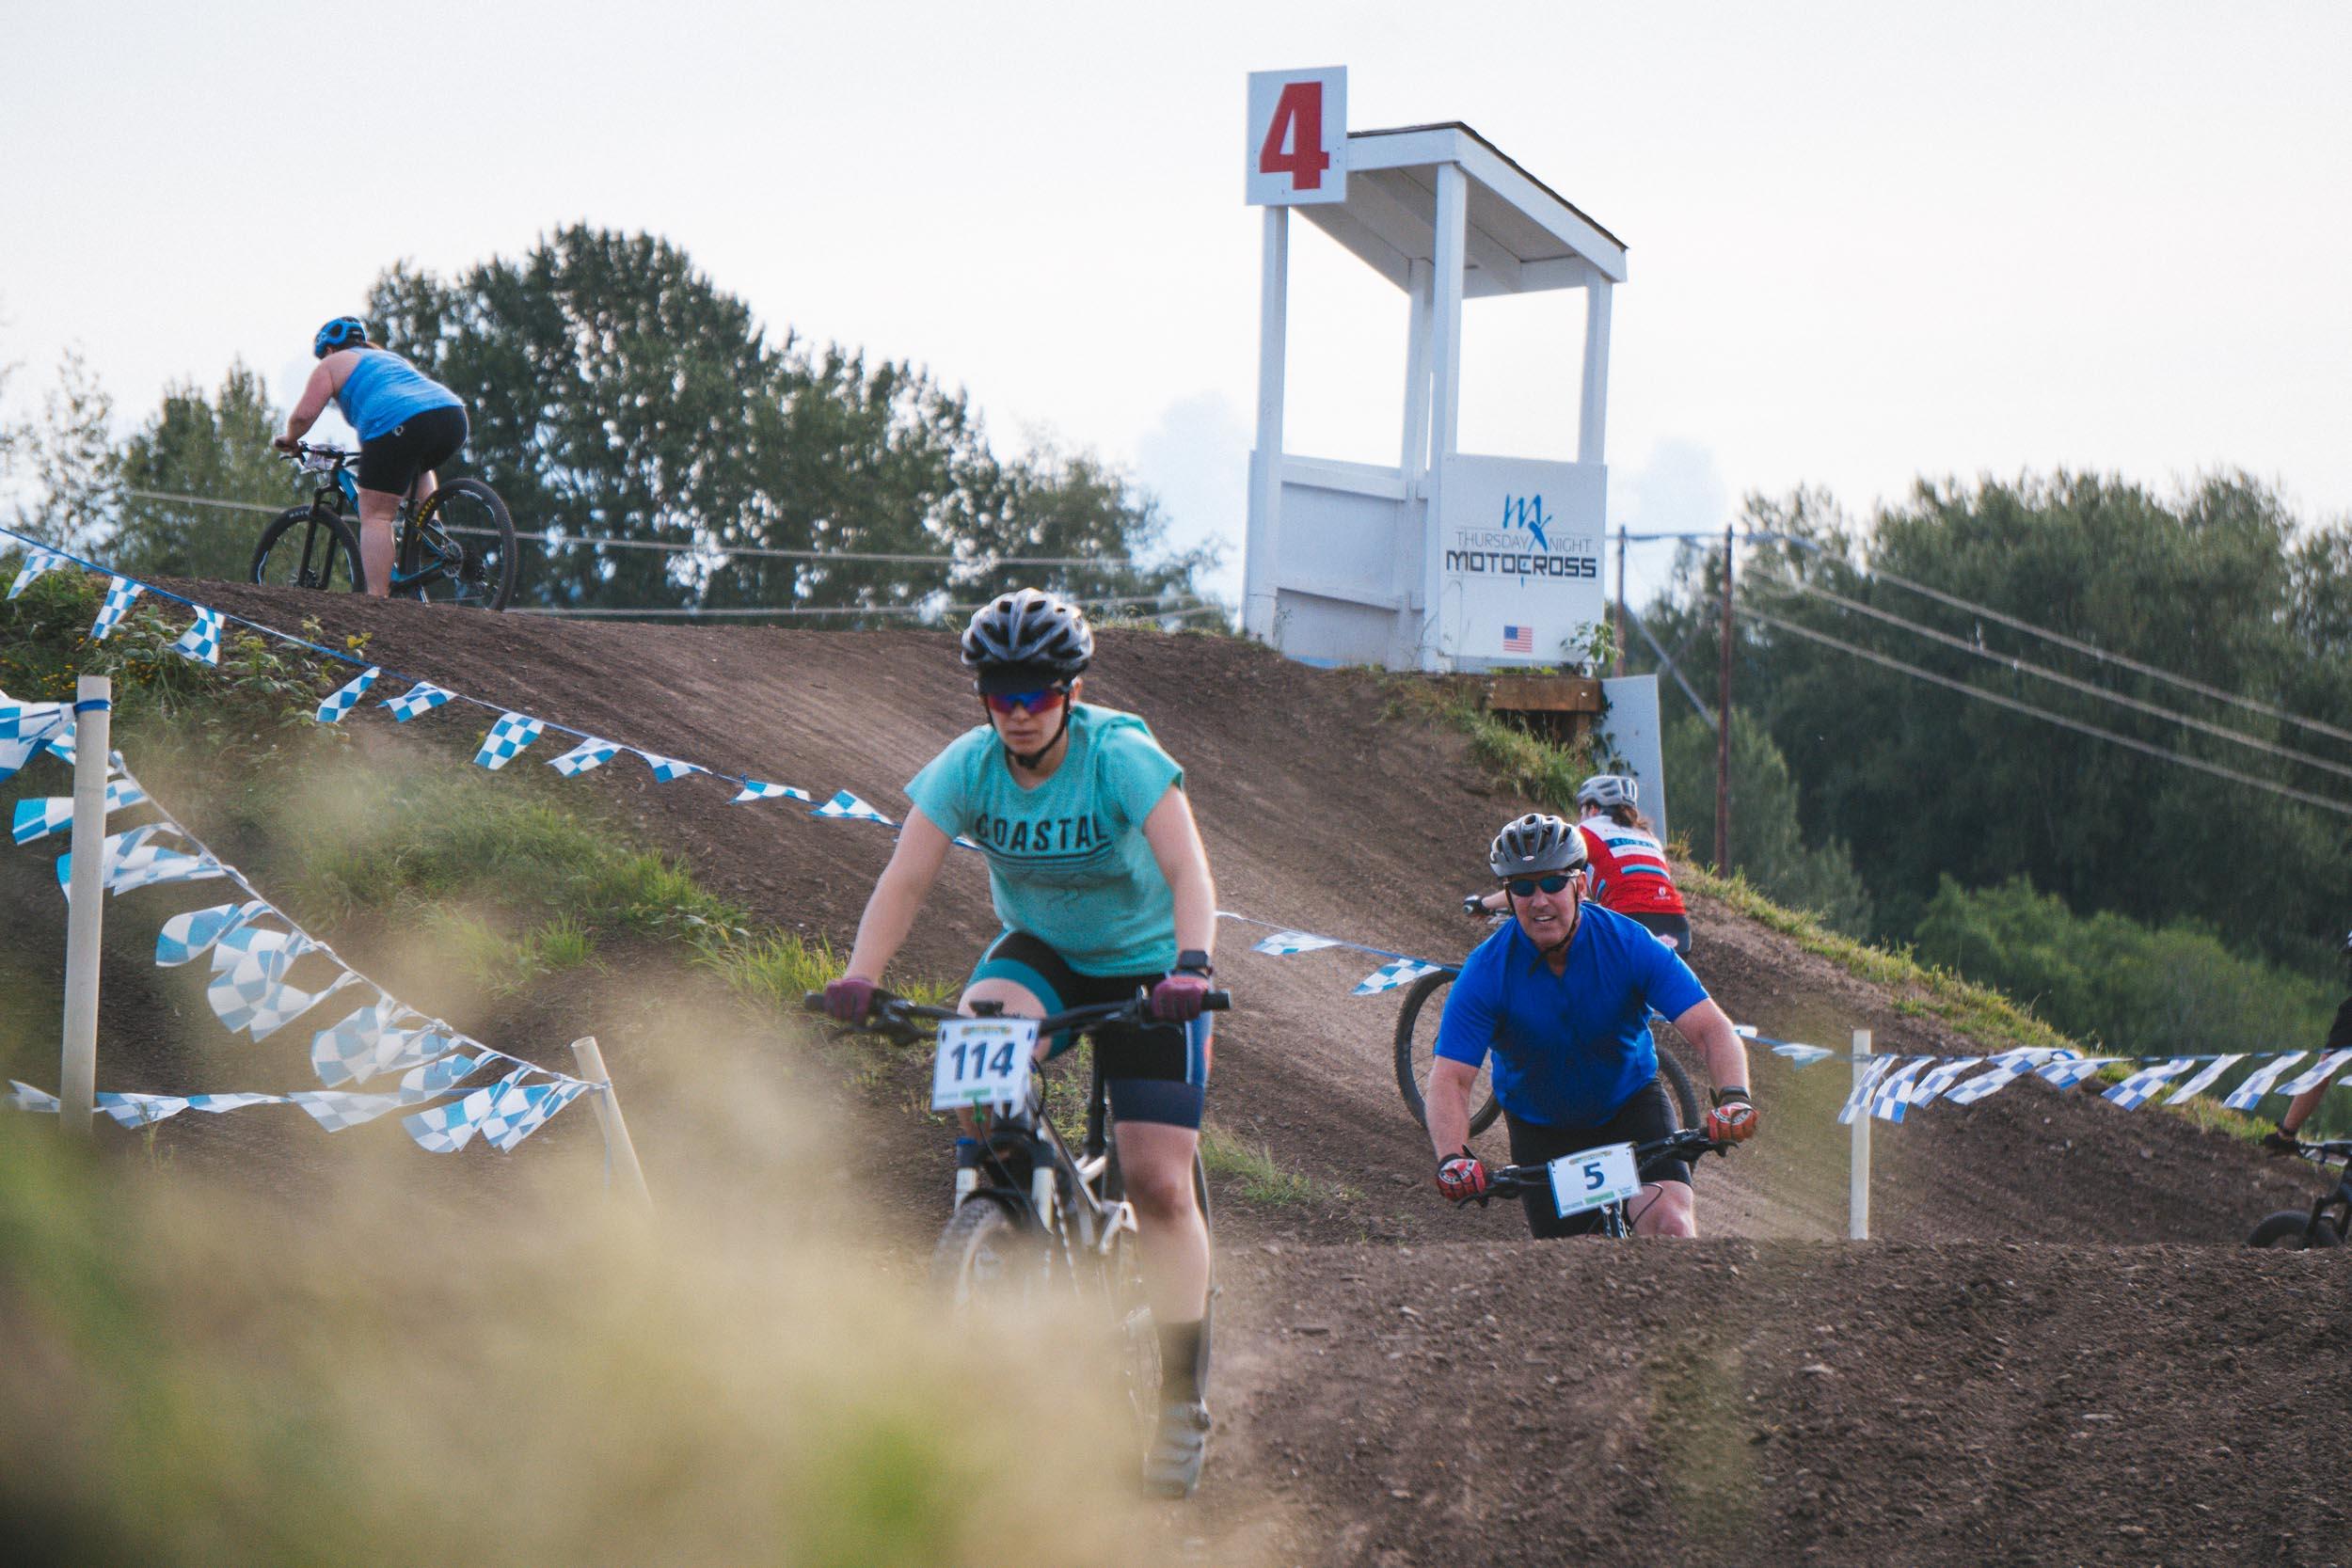 2018_Portland_ShortTrack_Race1_28.jpg